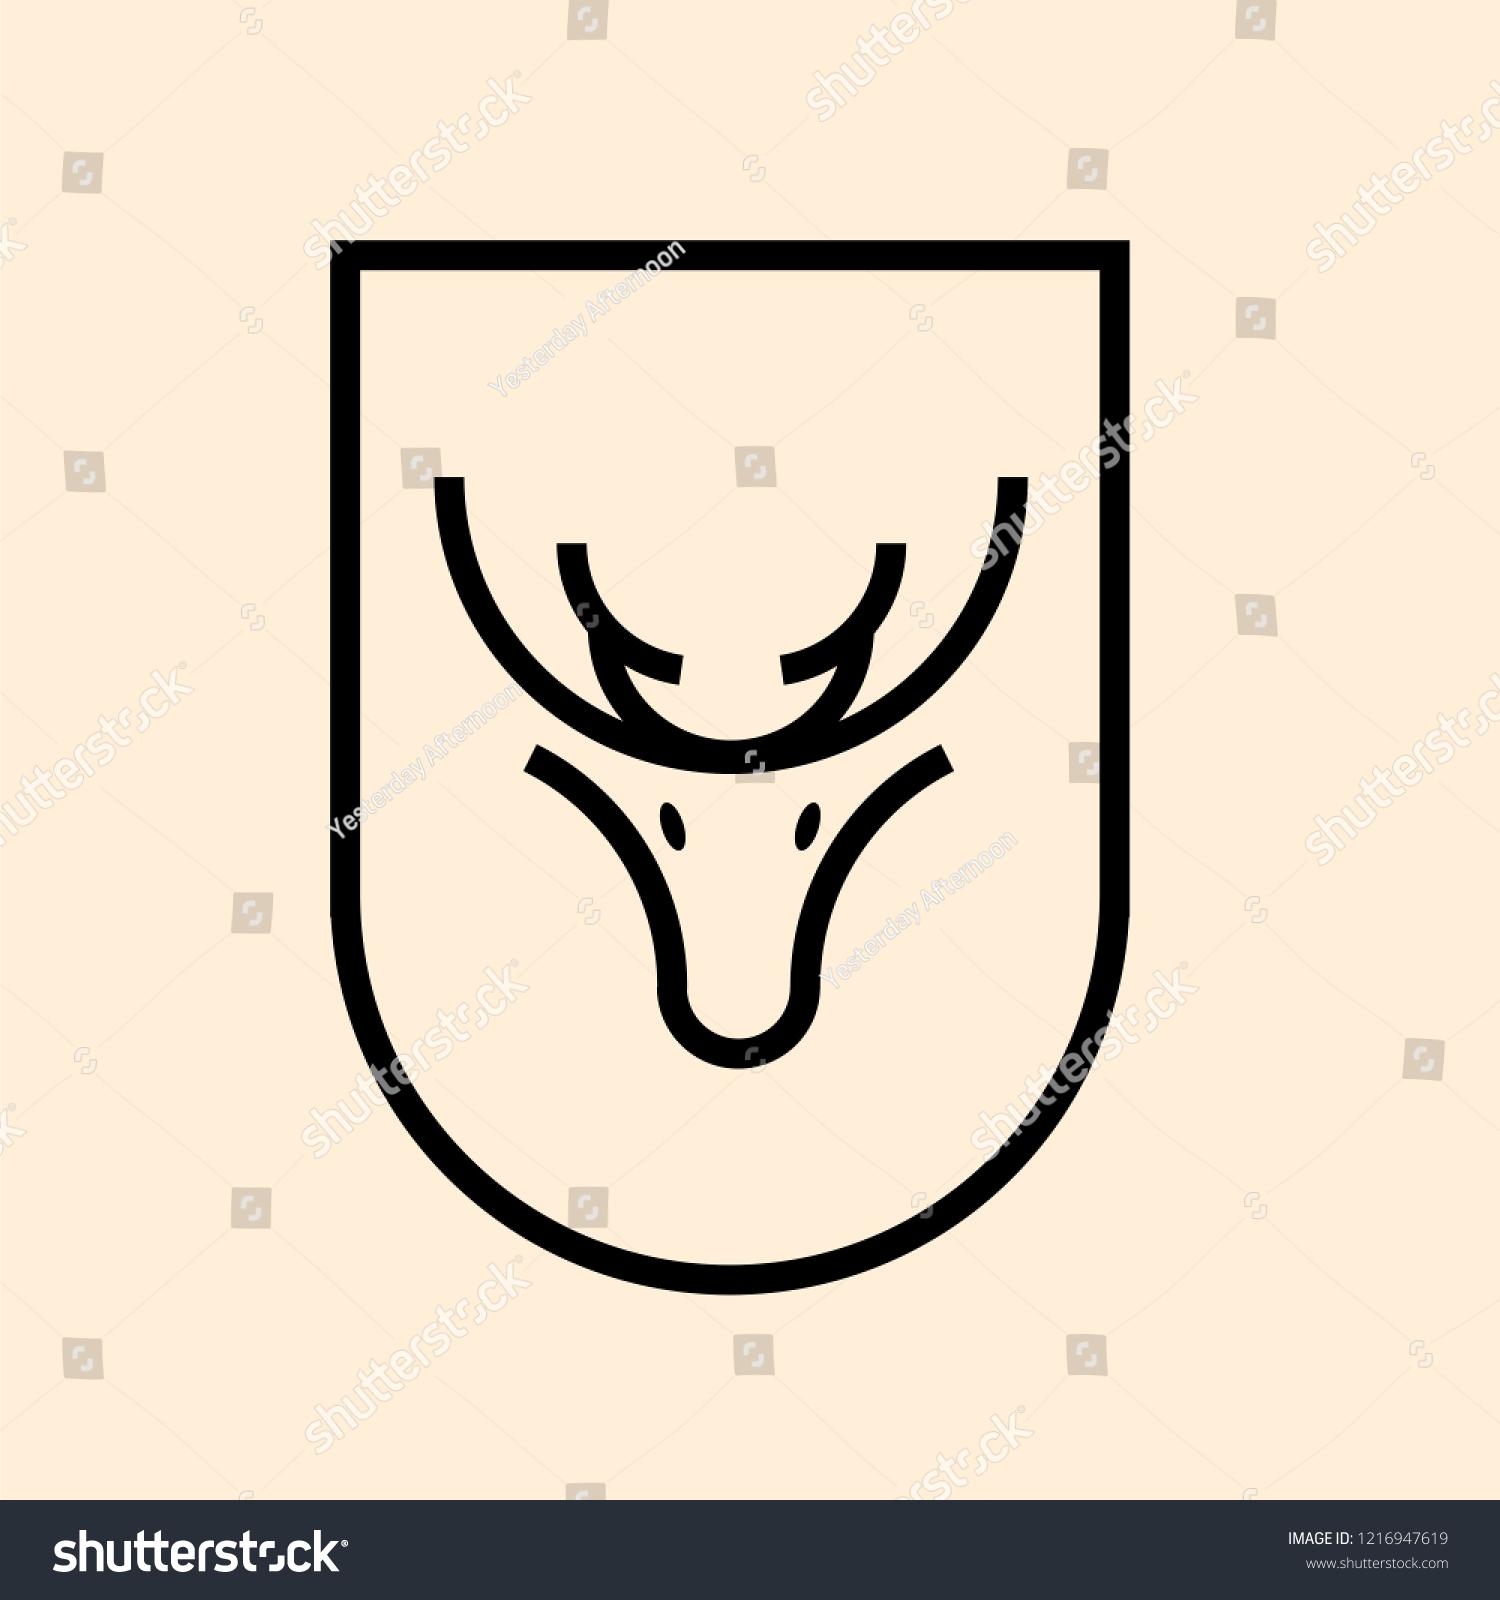 Inspirational Line Art Design Of Reindeer Head Vector Icon Template Illustration In Curvy Frame